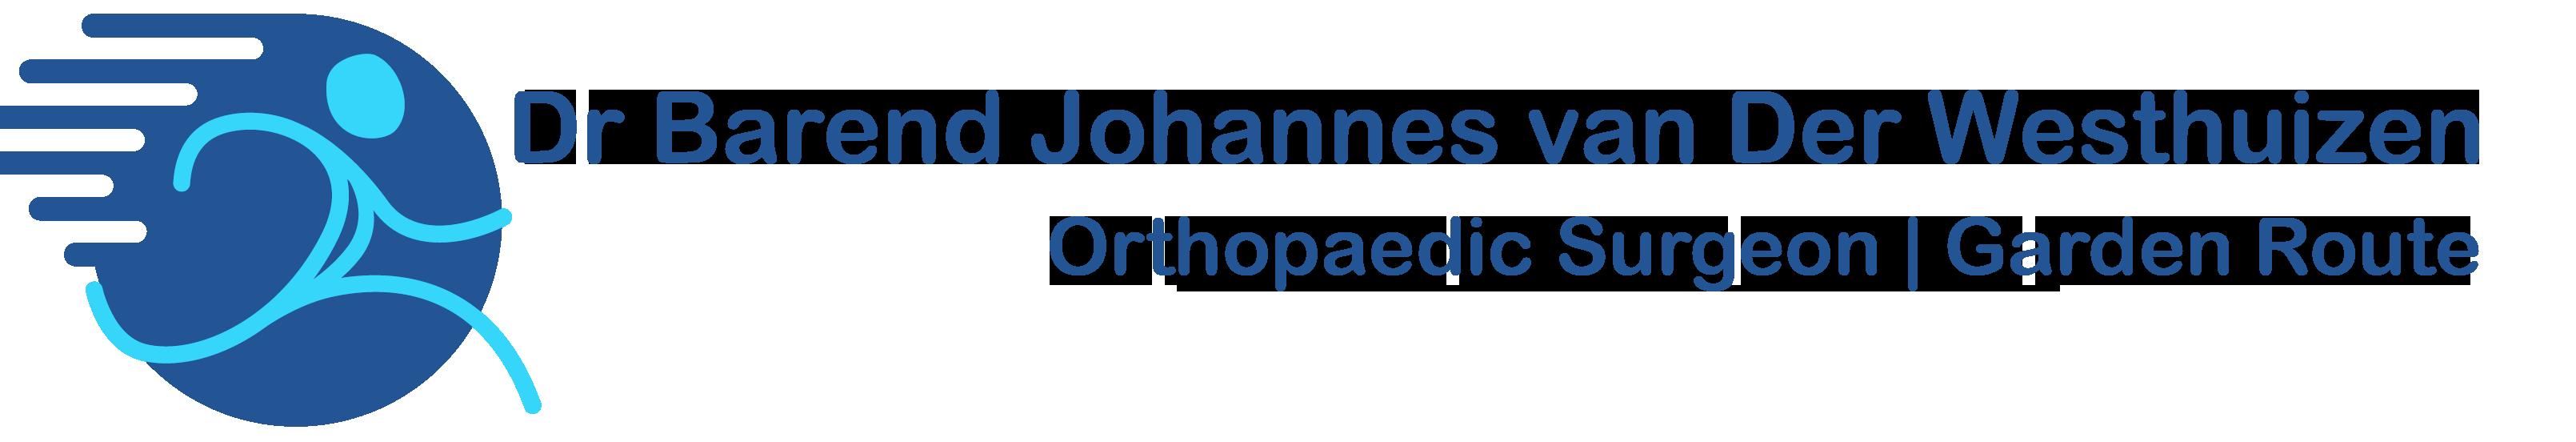 Dr Barend Johannes van Der Westhuizen | Orthopaedic Surgeon